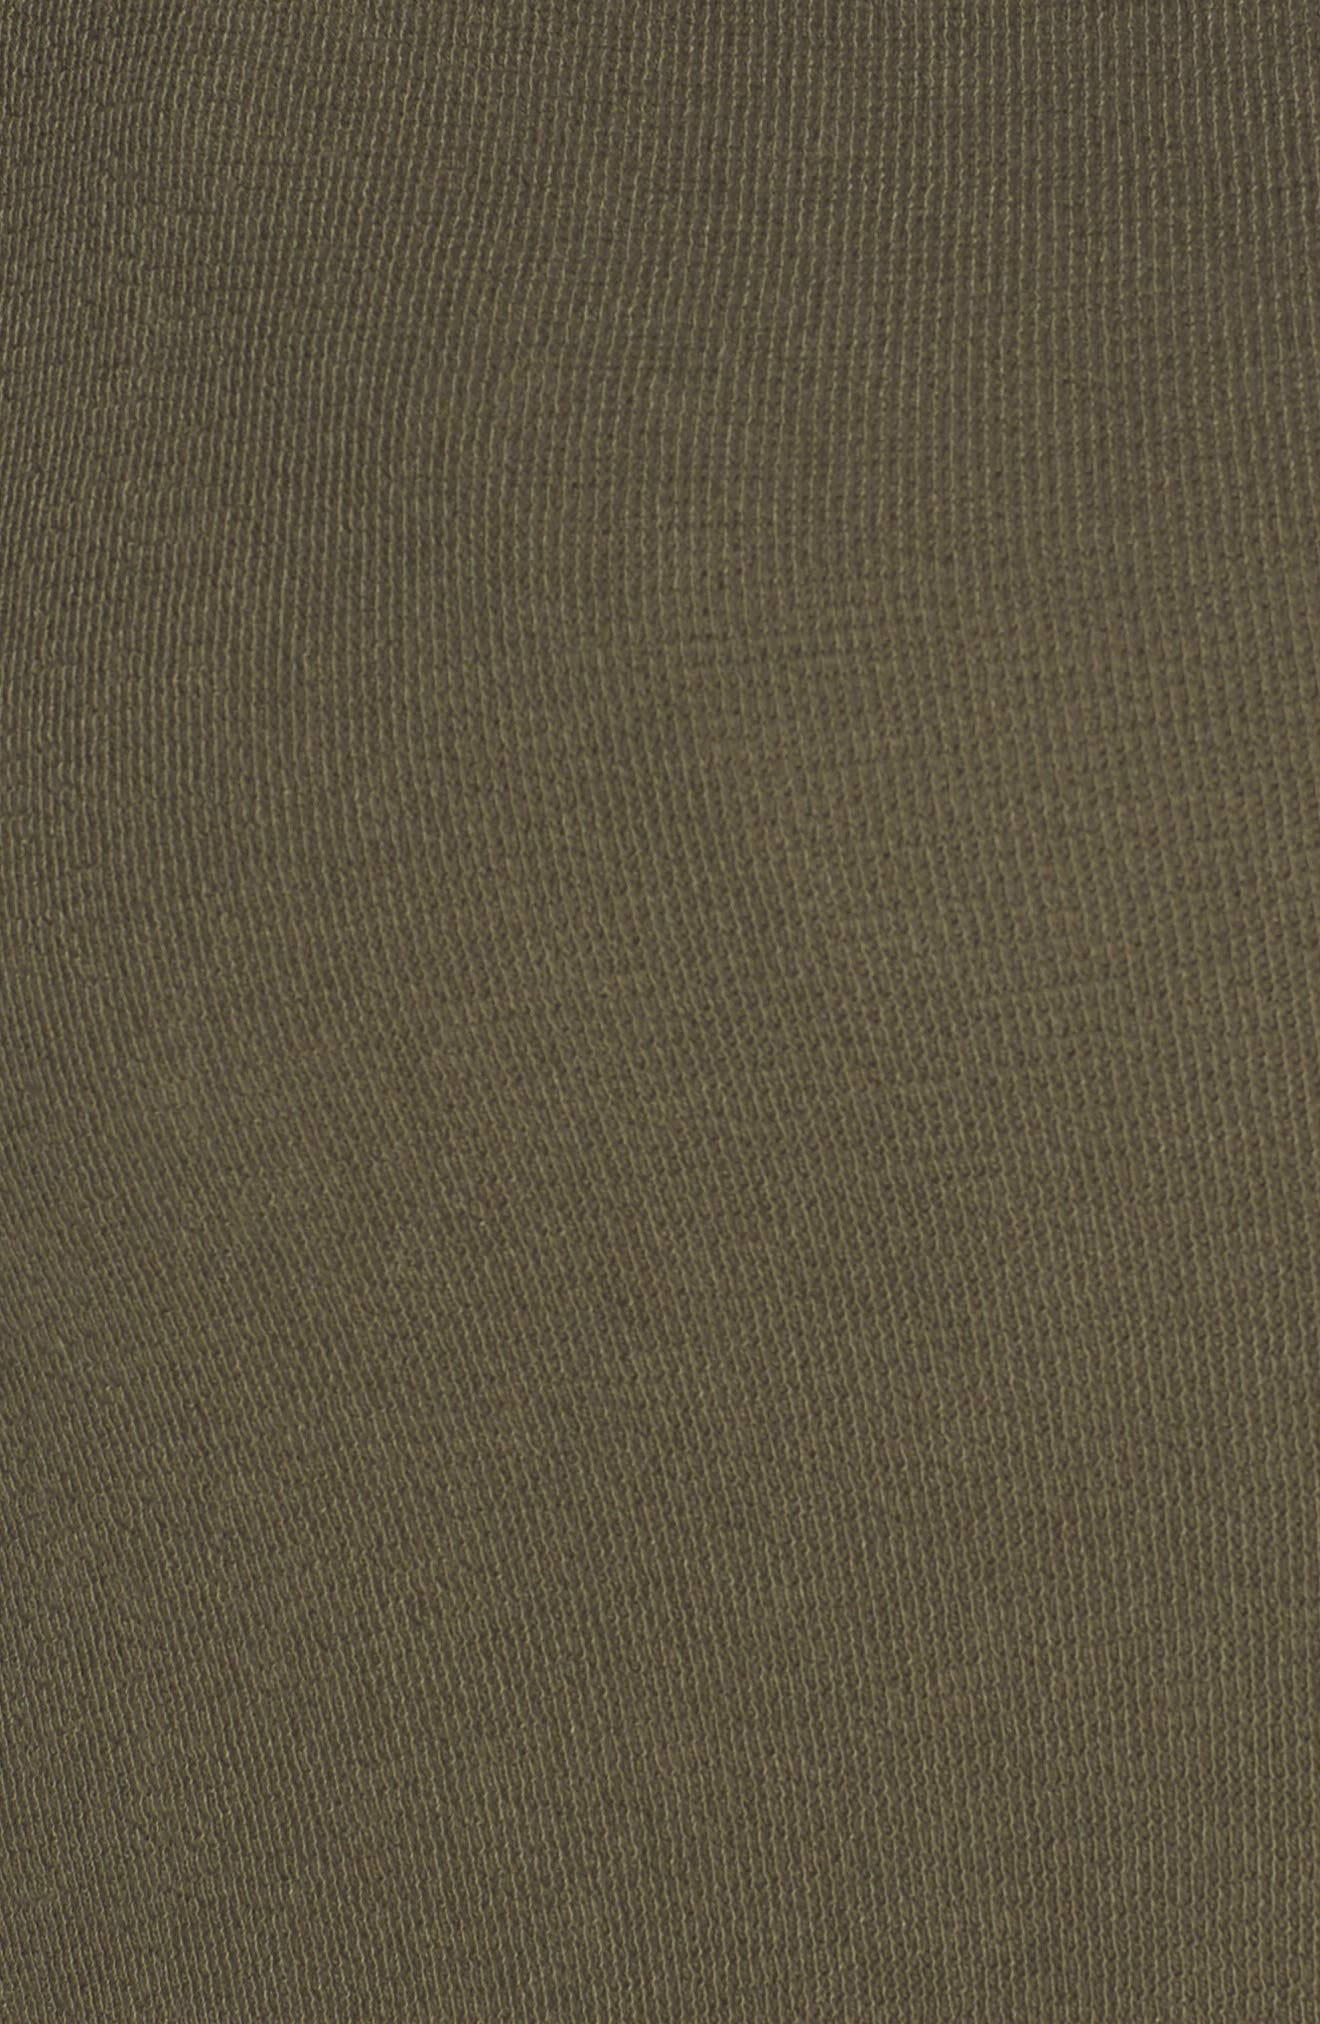 Knit Moto Jacket,                             Alternate thumbnail 7, color,                             OLIVE SARMA